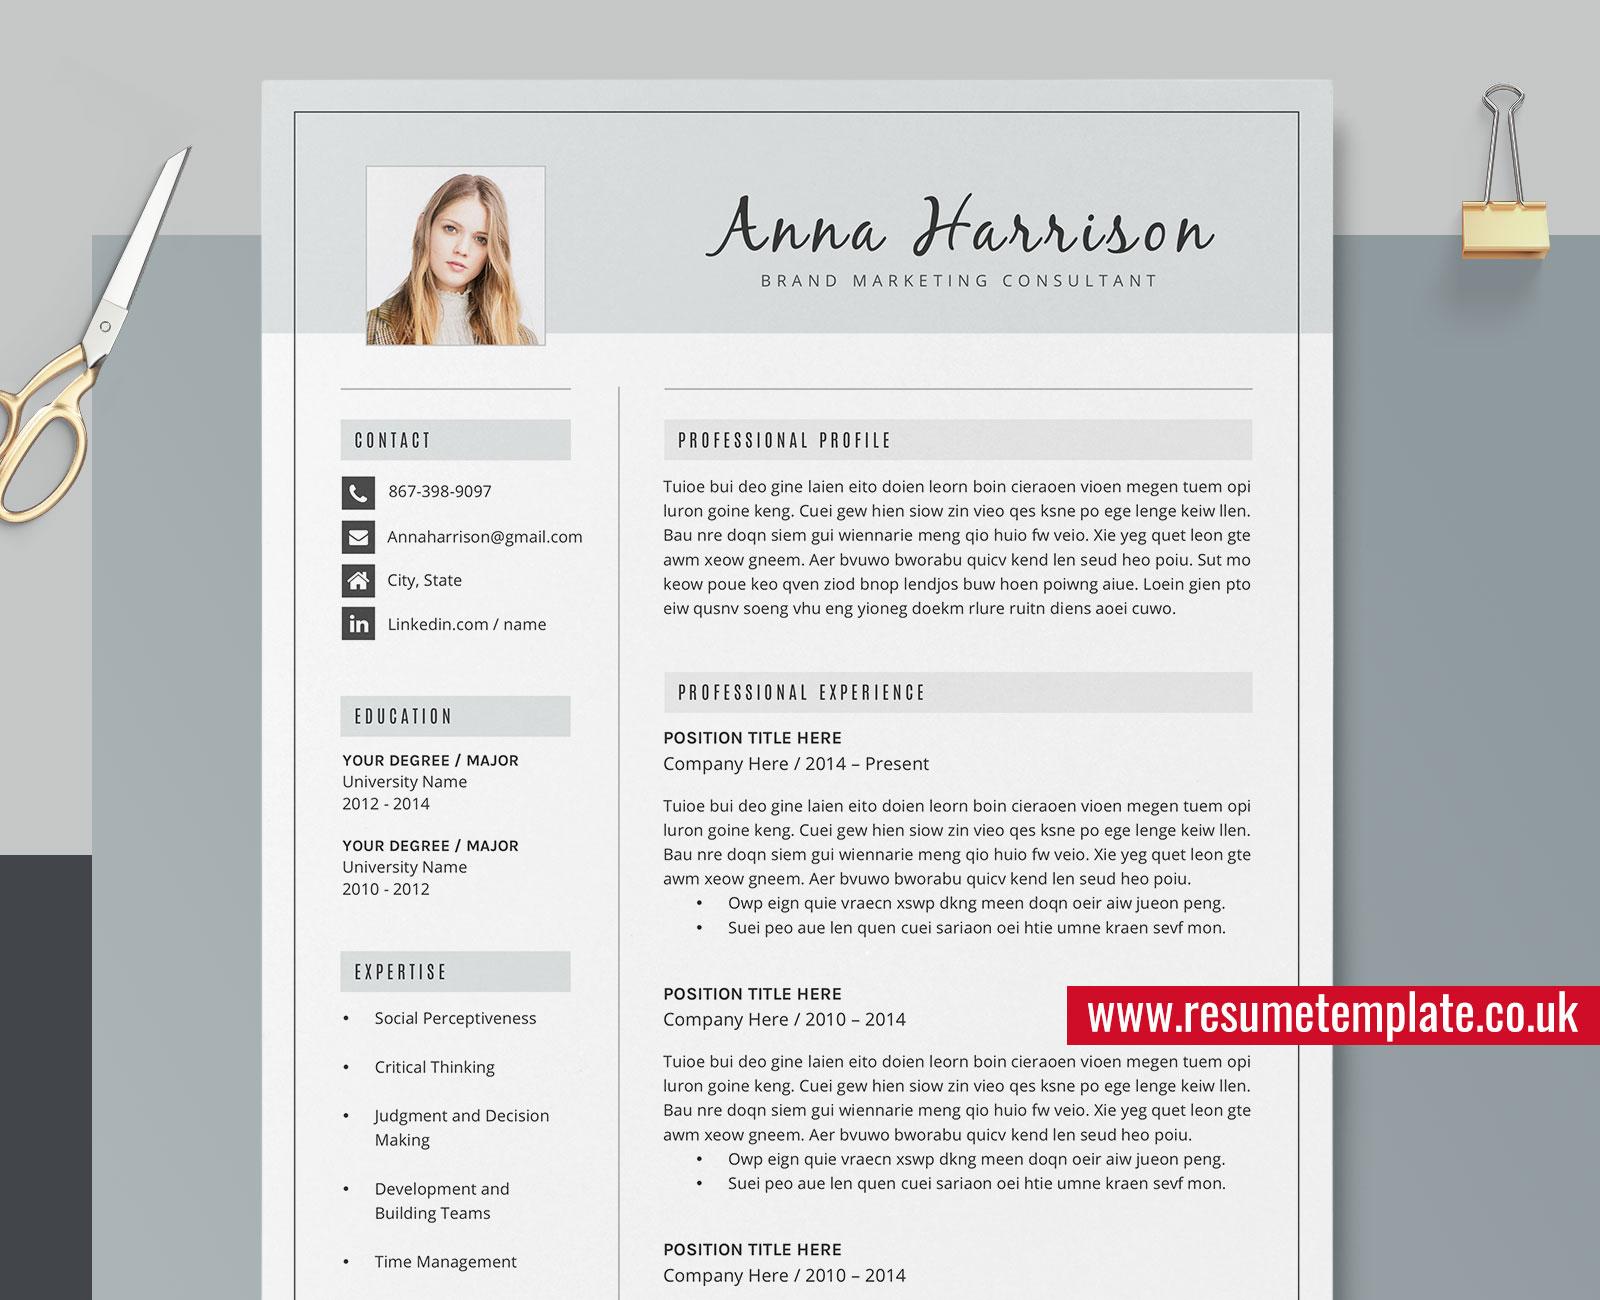 Professional Cv Design from www.resumetemplate.co.uk